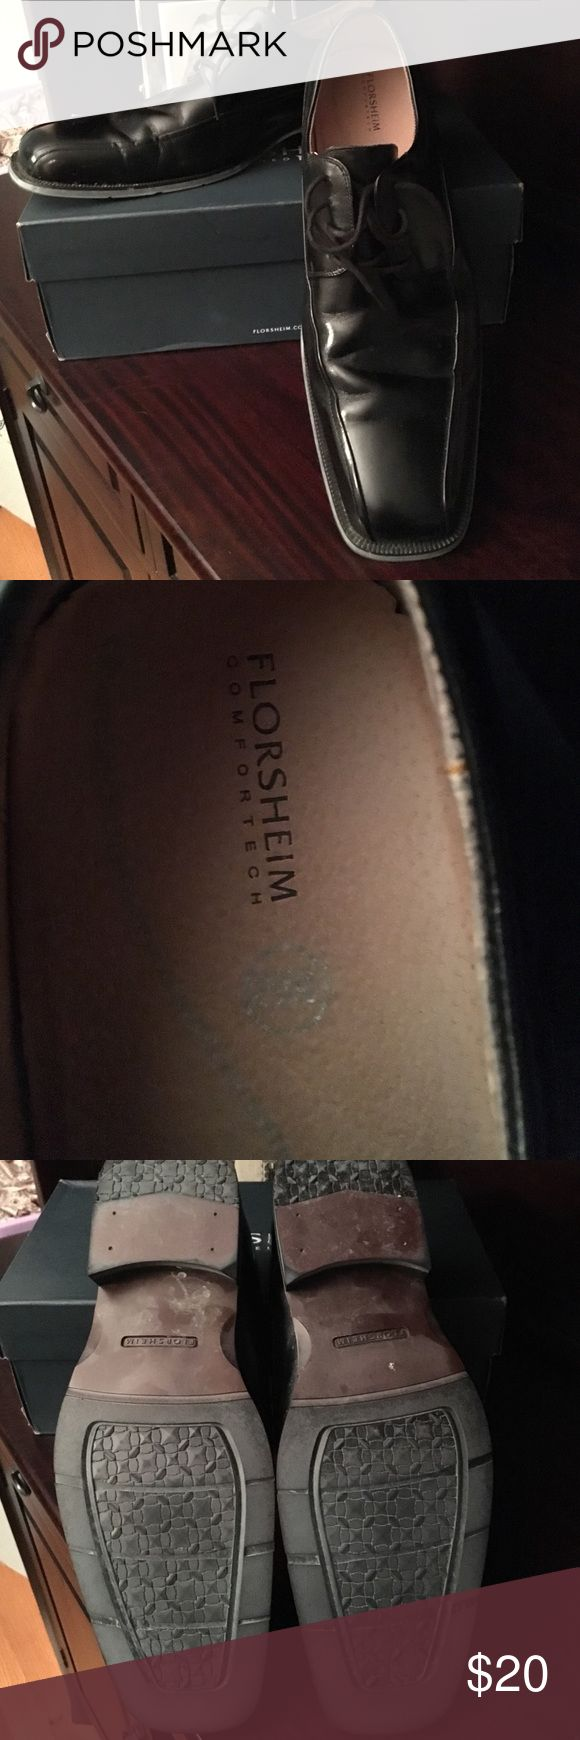 Florsheim Alavla Shoes size 13 Men's Worn twice--men's shoes. Florsheim Shoes